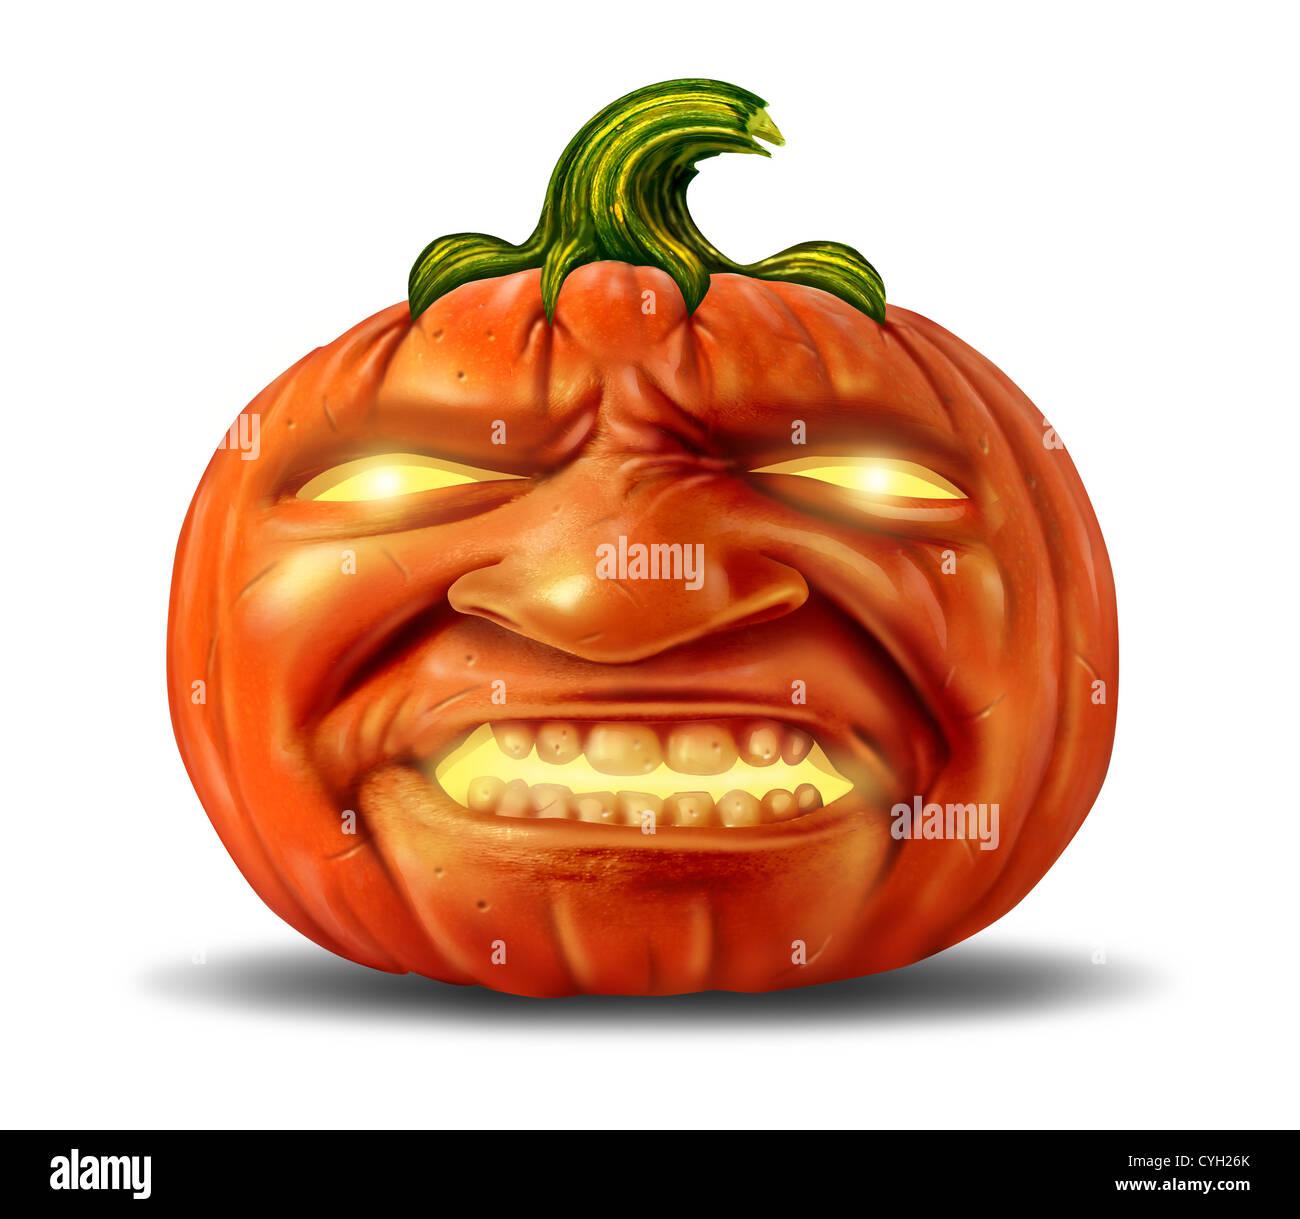 Scary Pumpkin Jack O Lantern With An Angry Devil Like Realistic Human Stock Photo Alamy